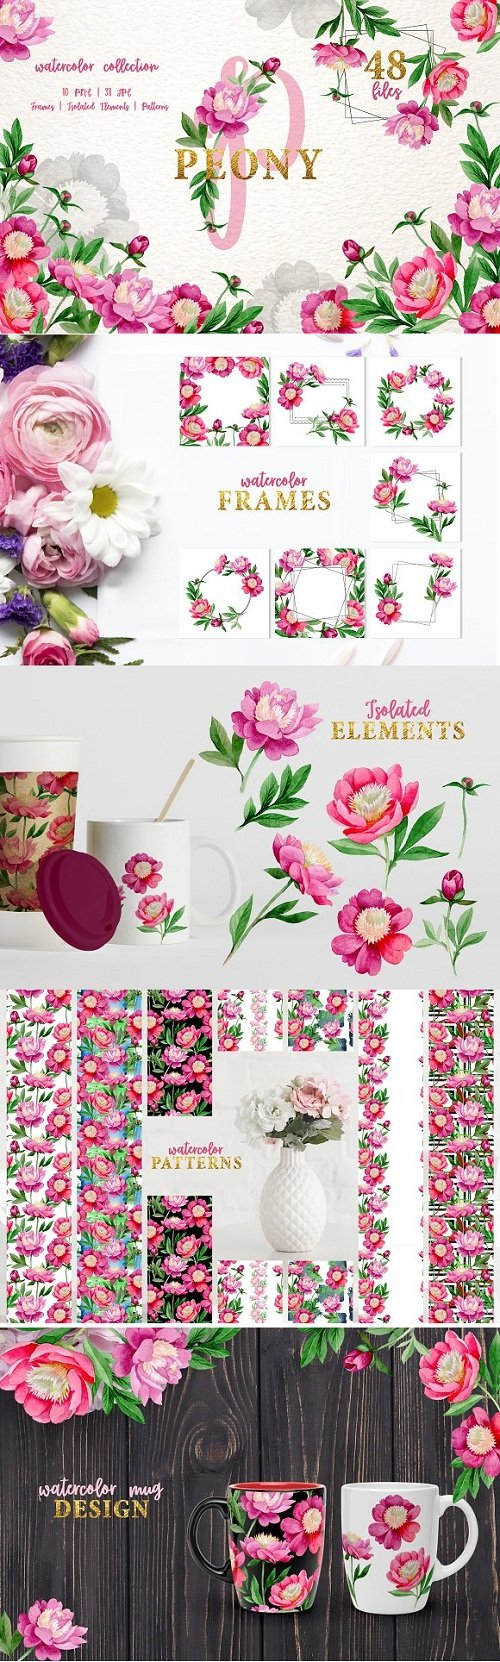 Pink Peony Tenderness Watercolor png - 3419321